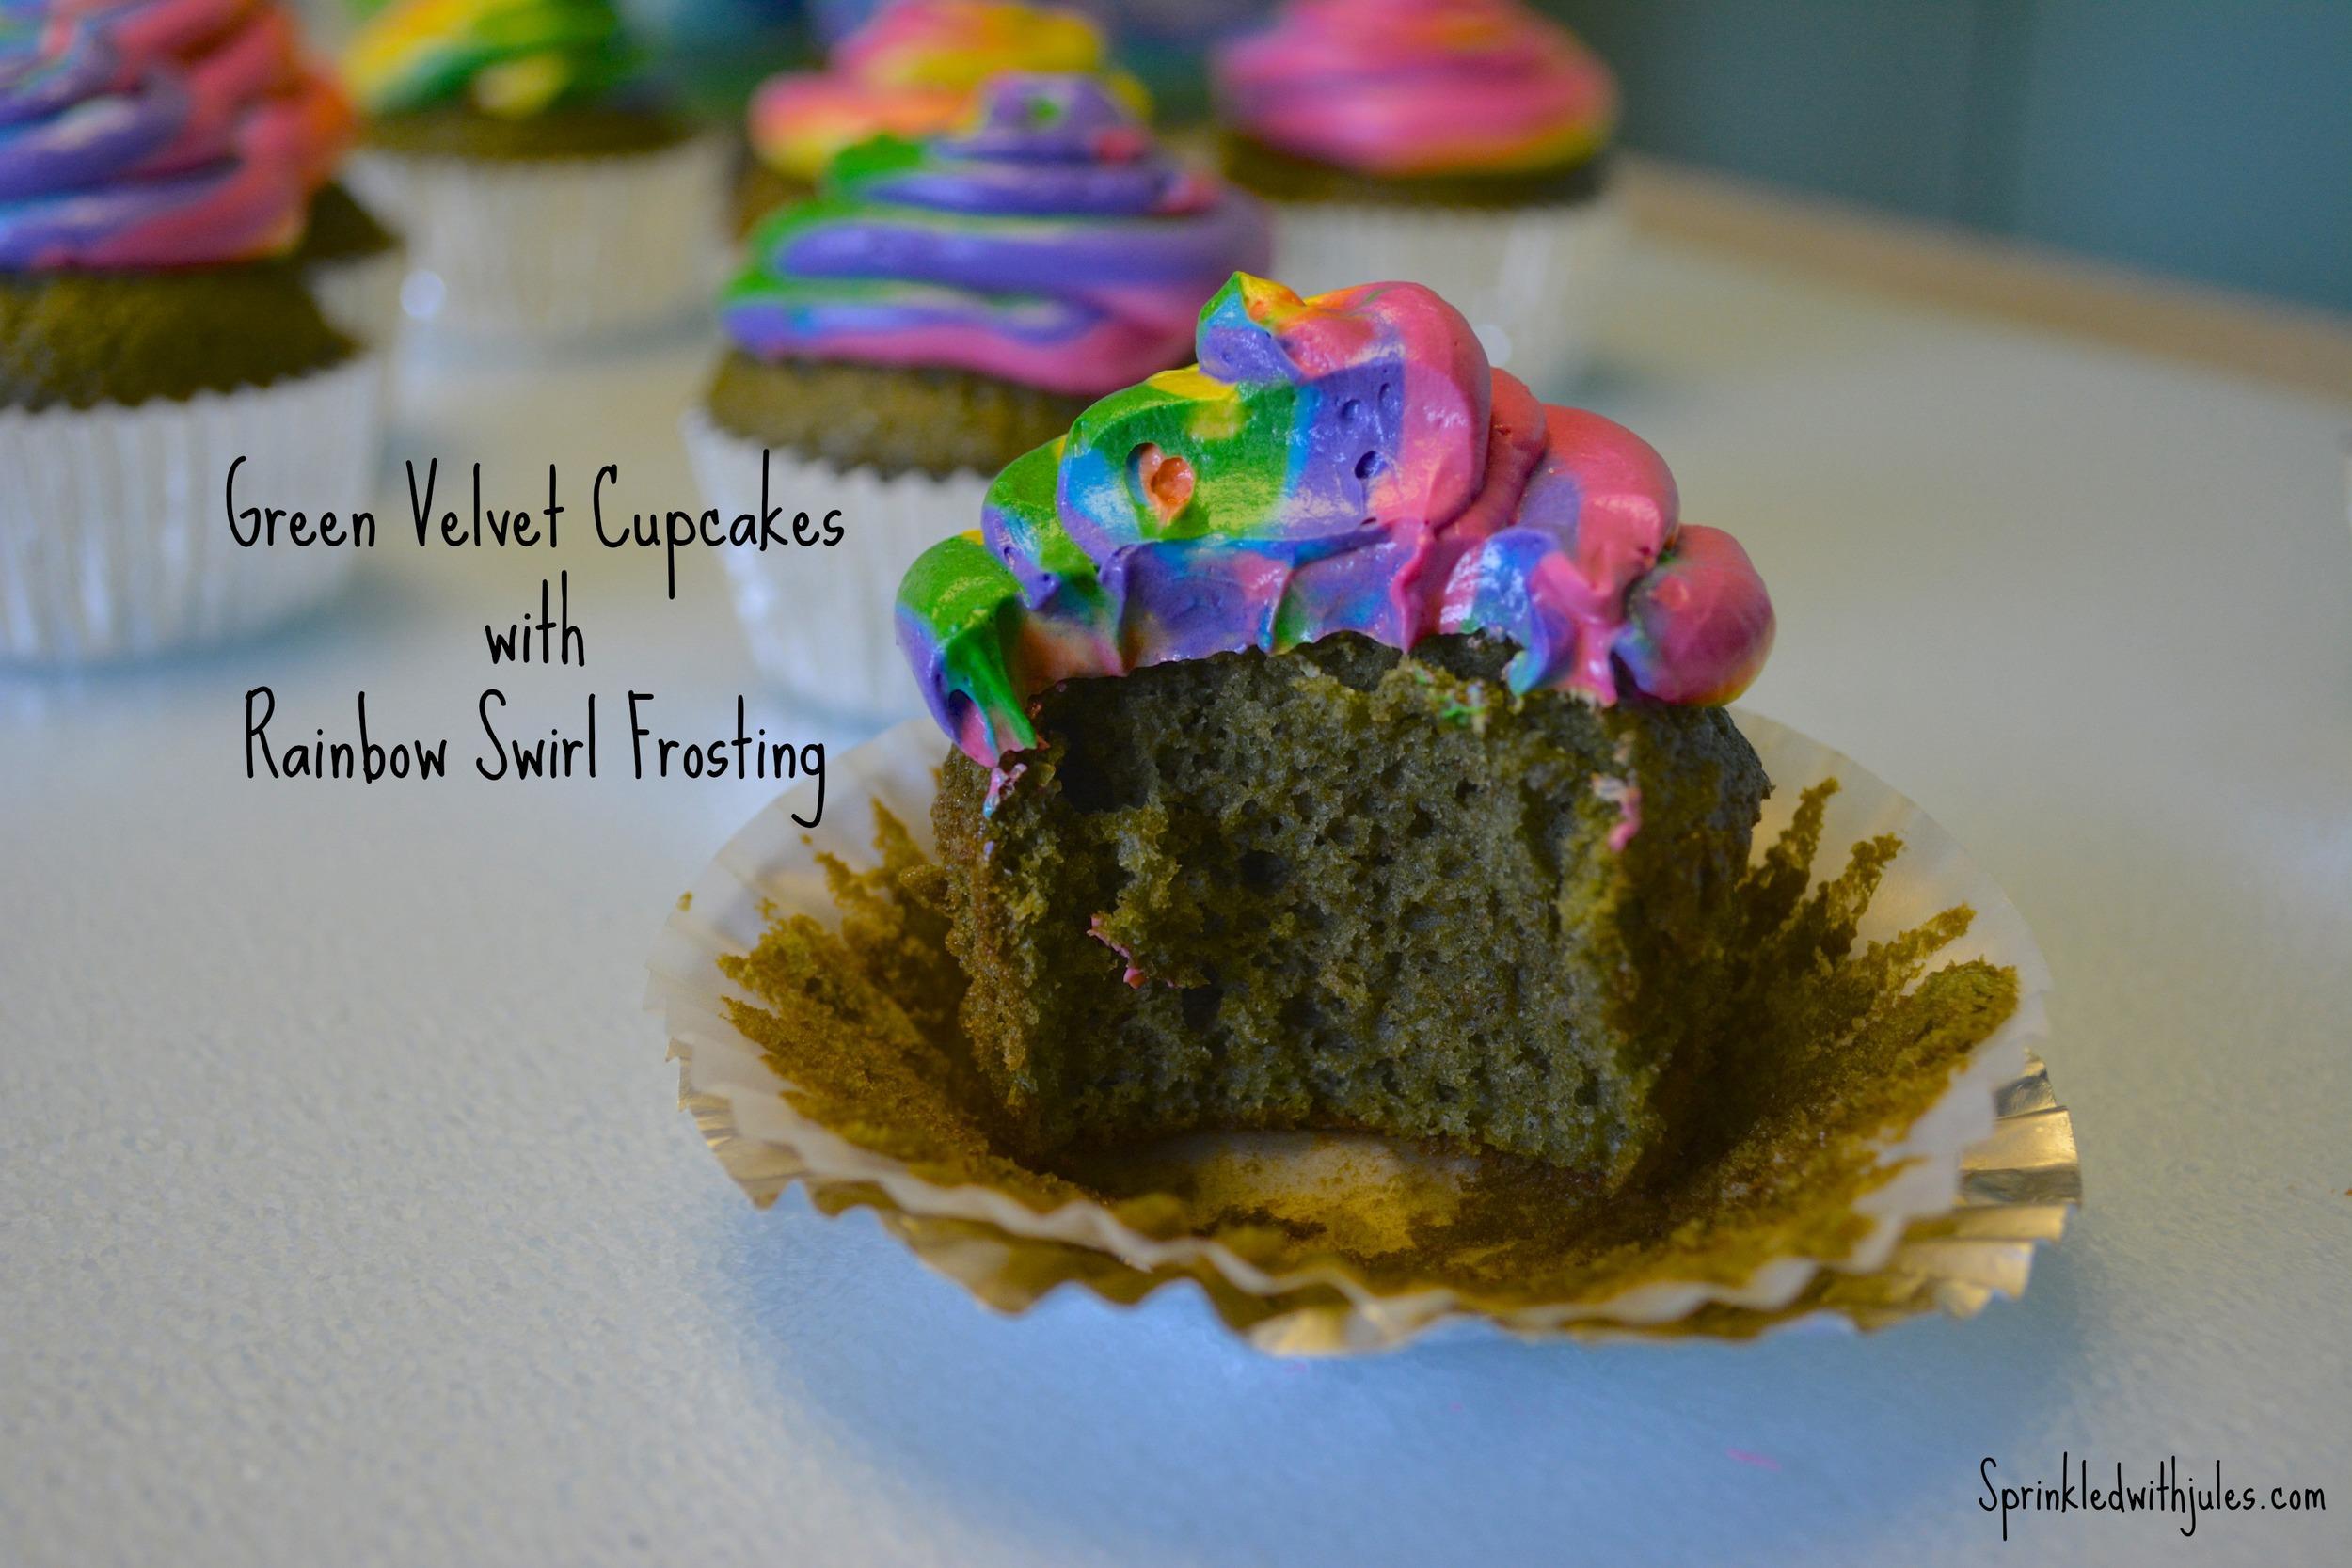 Green Velvet Cupcakes with Rainbow Swirl Frosting